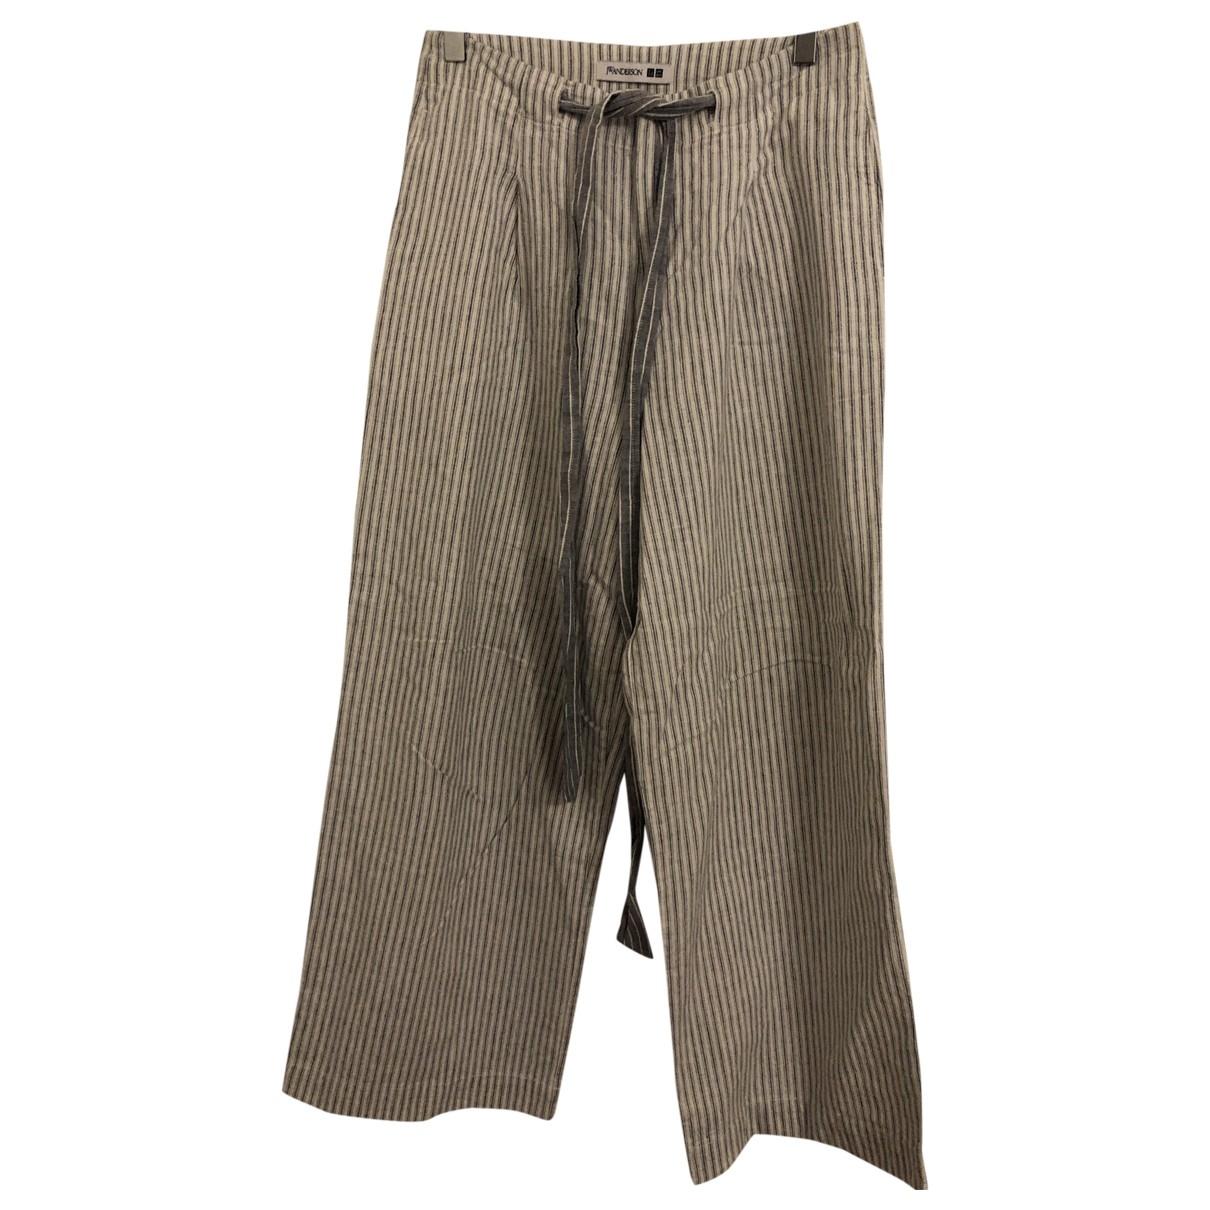 Uniqlo \N White Linen Trousers for Women S International